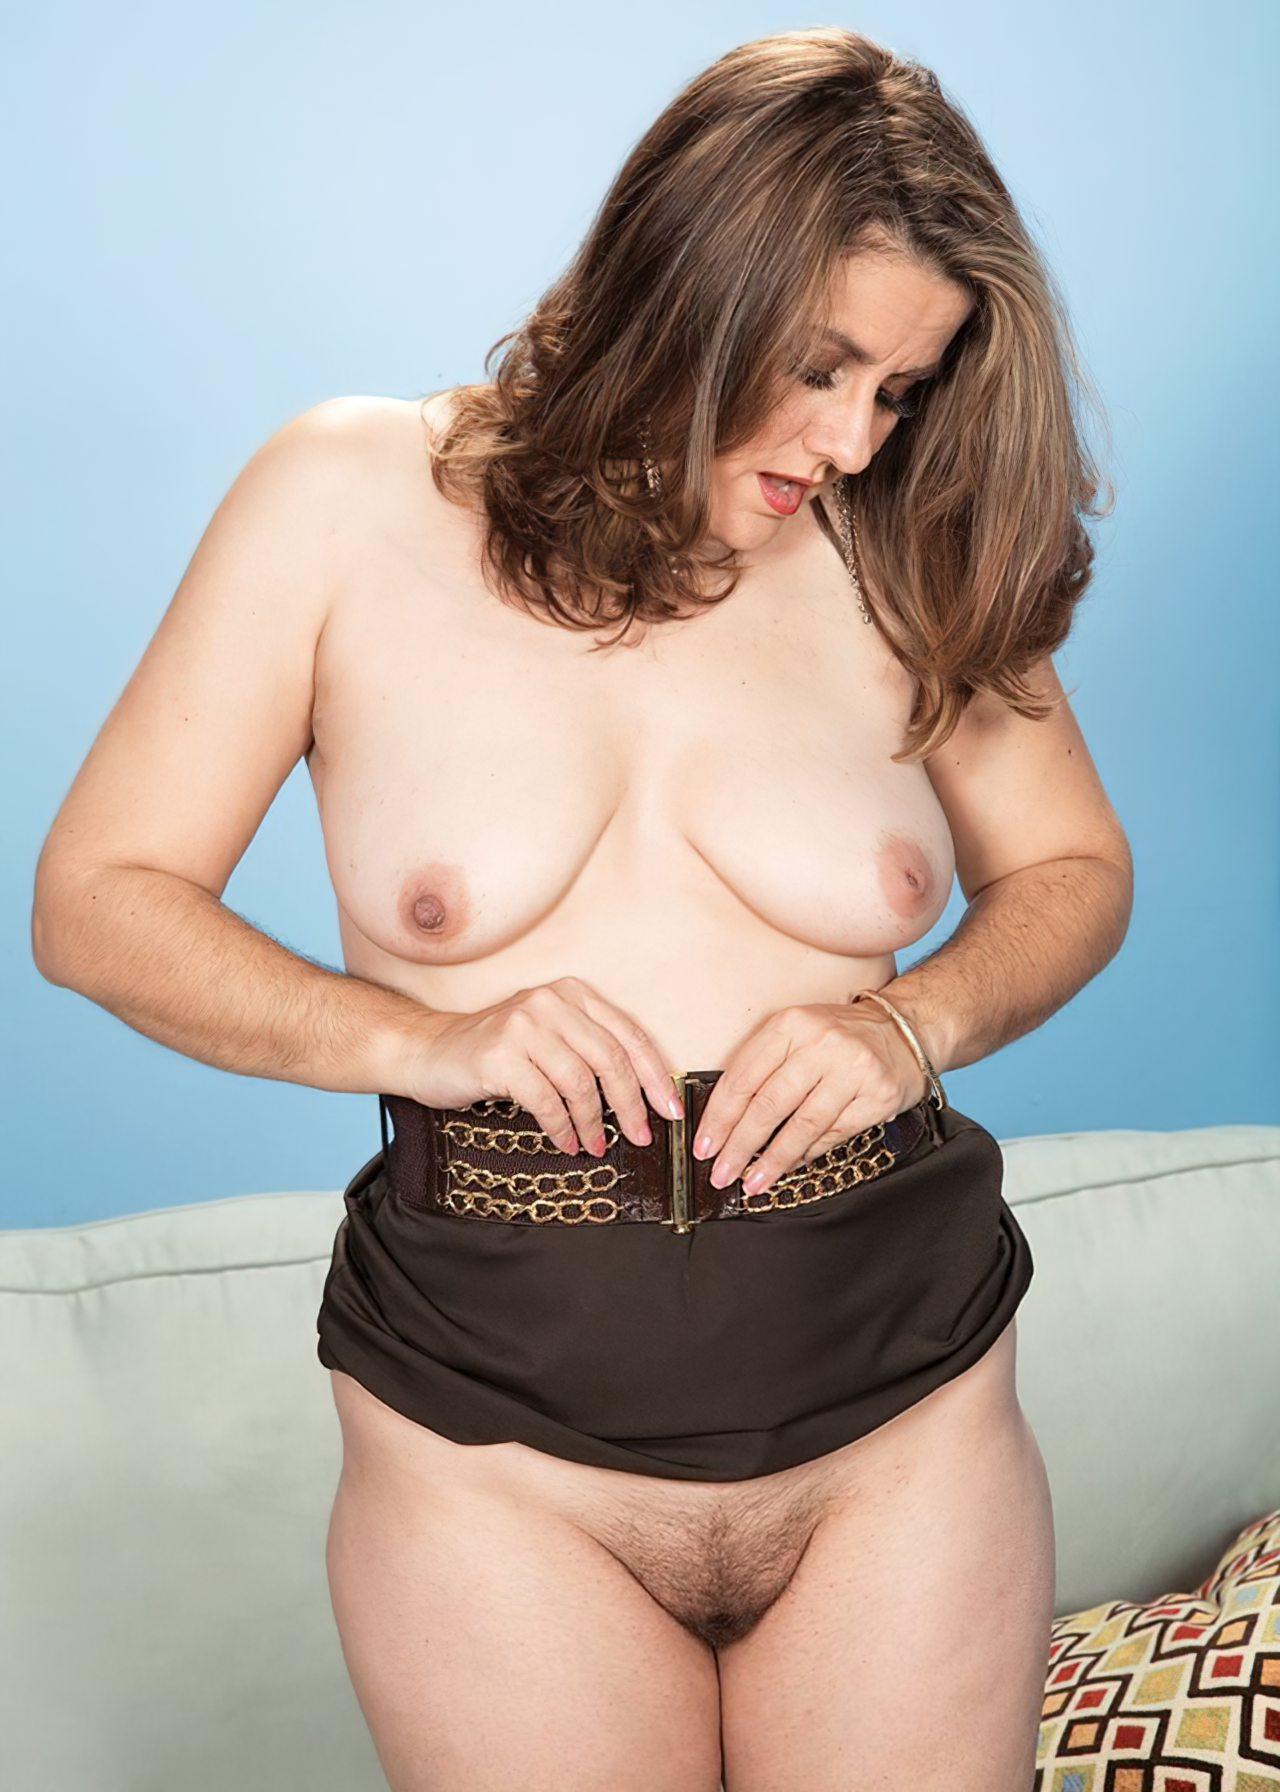 videos de sexo anal mulheres maduras nuas